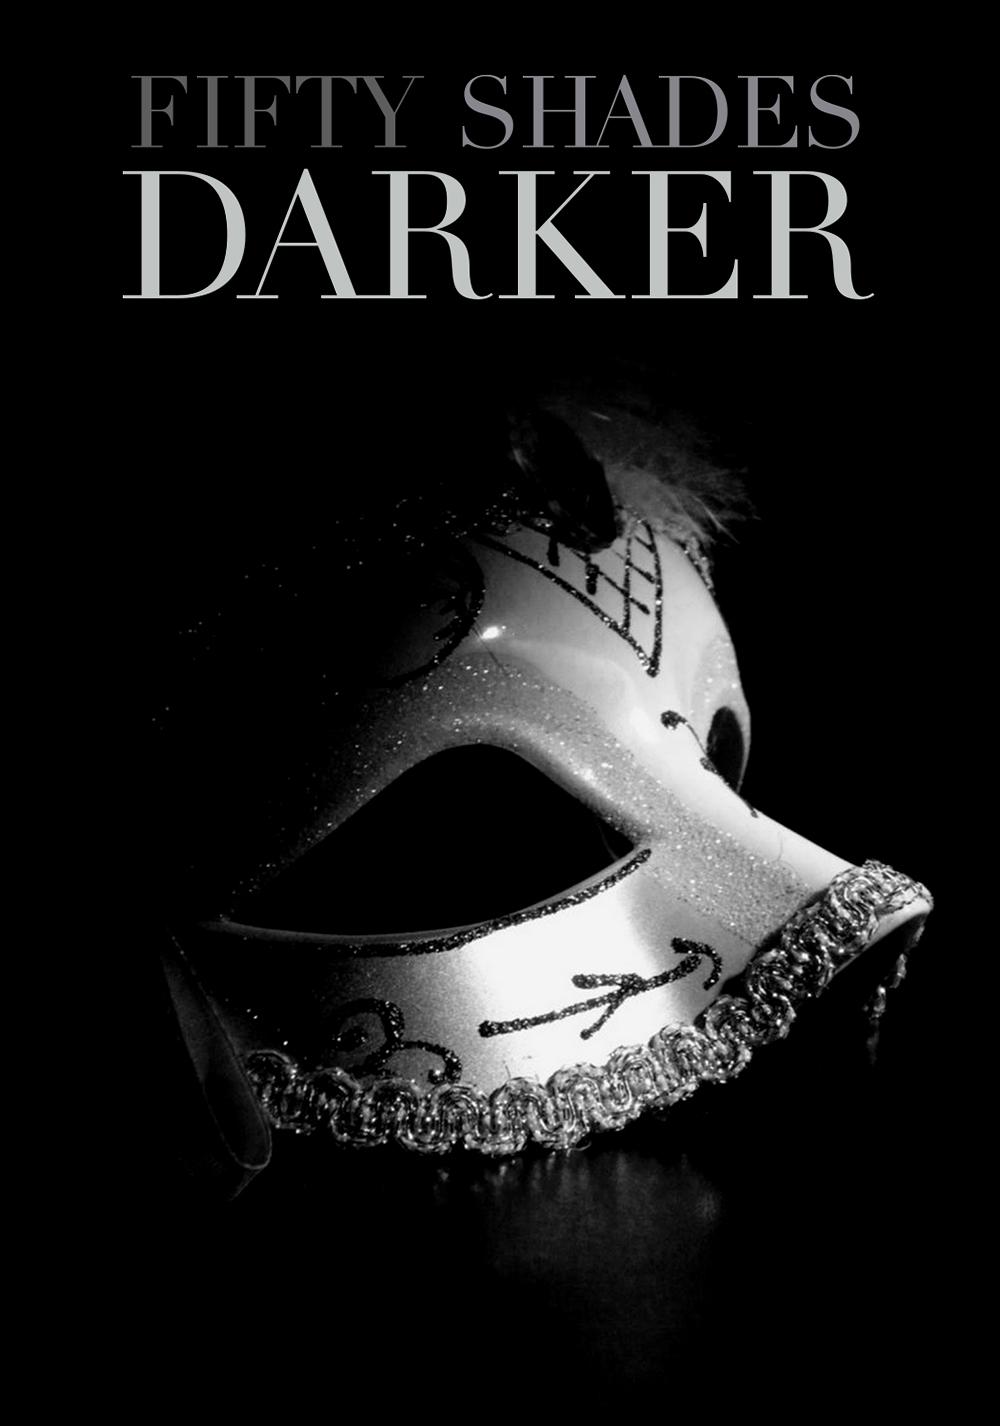 Fifty Shades Darker   Movie fanart   fanart.tv